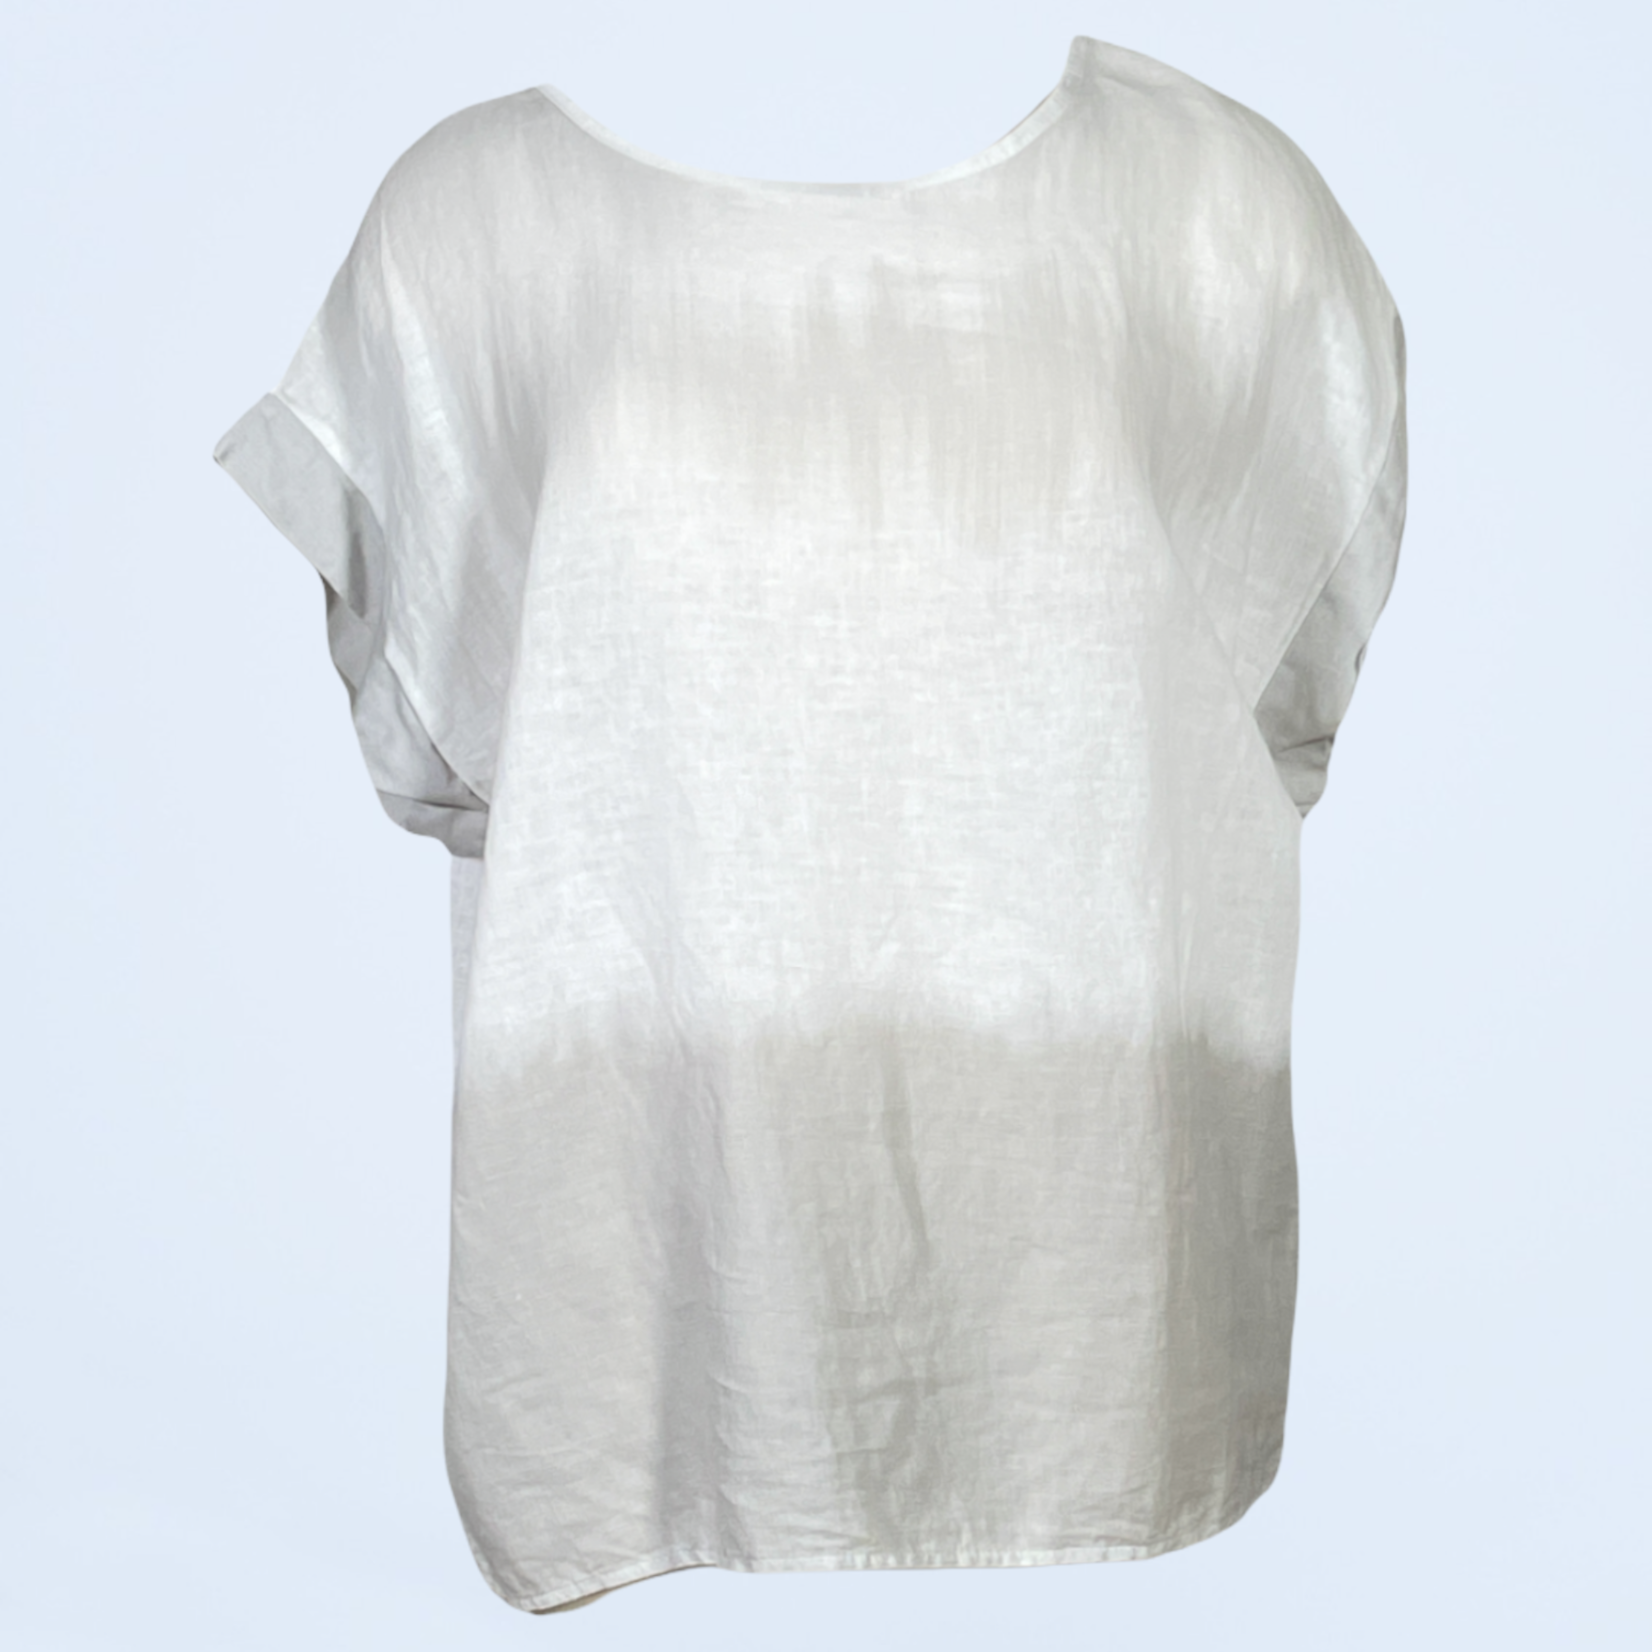 Short Sleeve Ombre Top